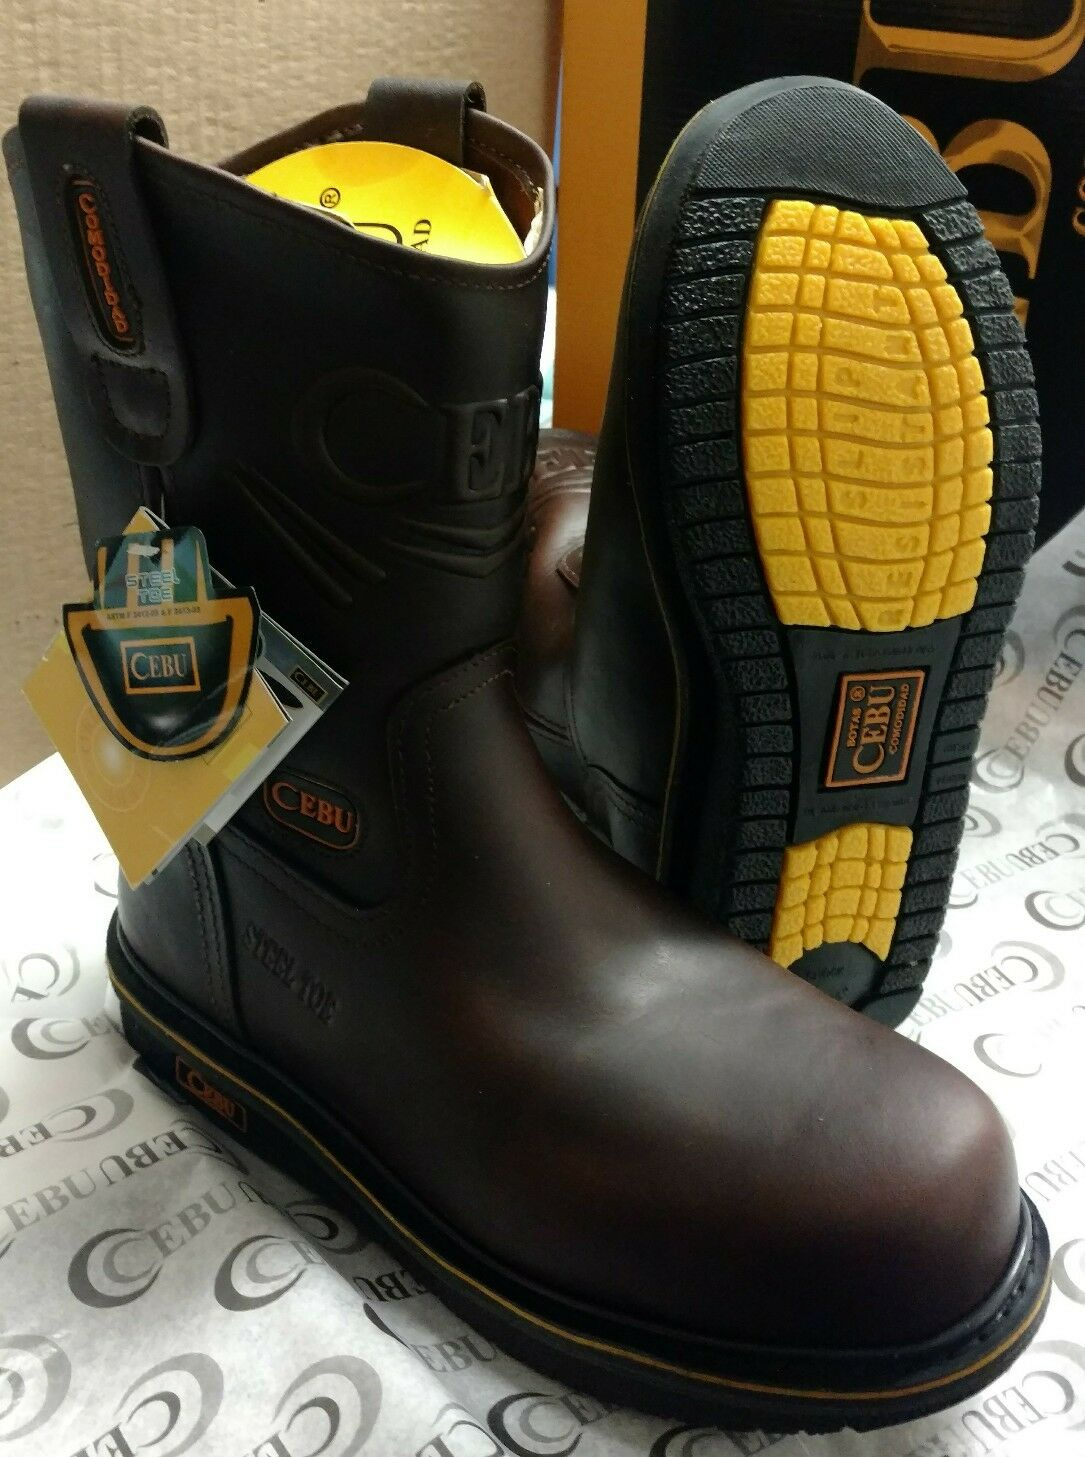 Cebu Comfort Mens Leather Steel Toe Work Safety Boots Slip Oil Resistant Brown